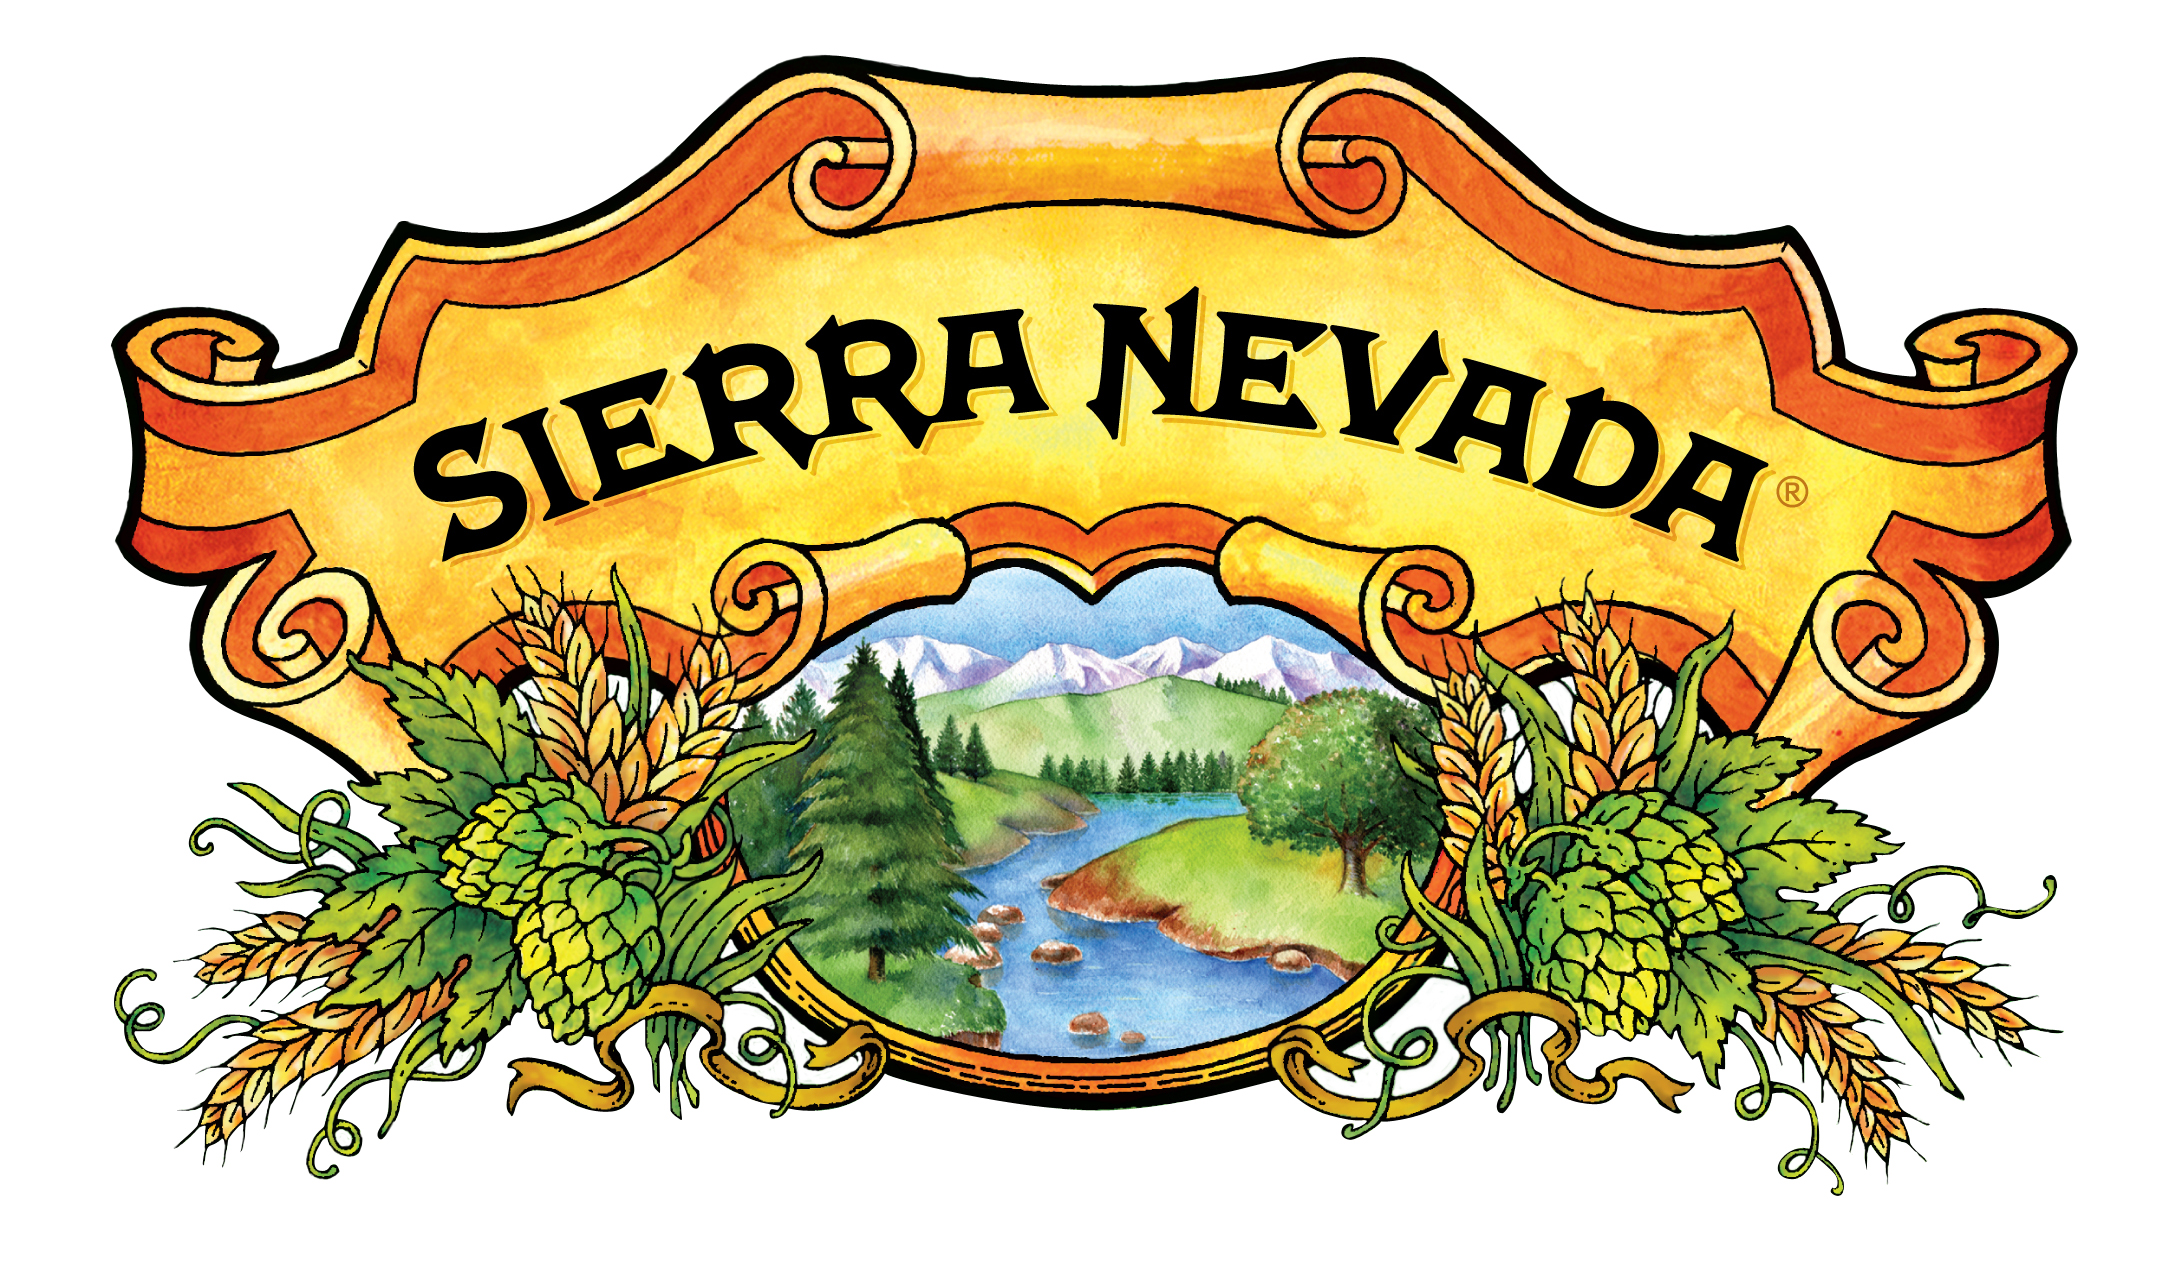 Sierra Nevada clipart #11, Download drawings